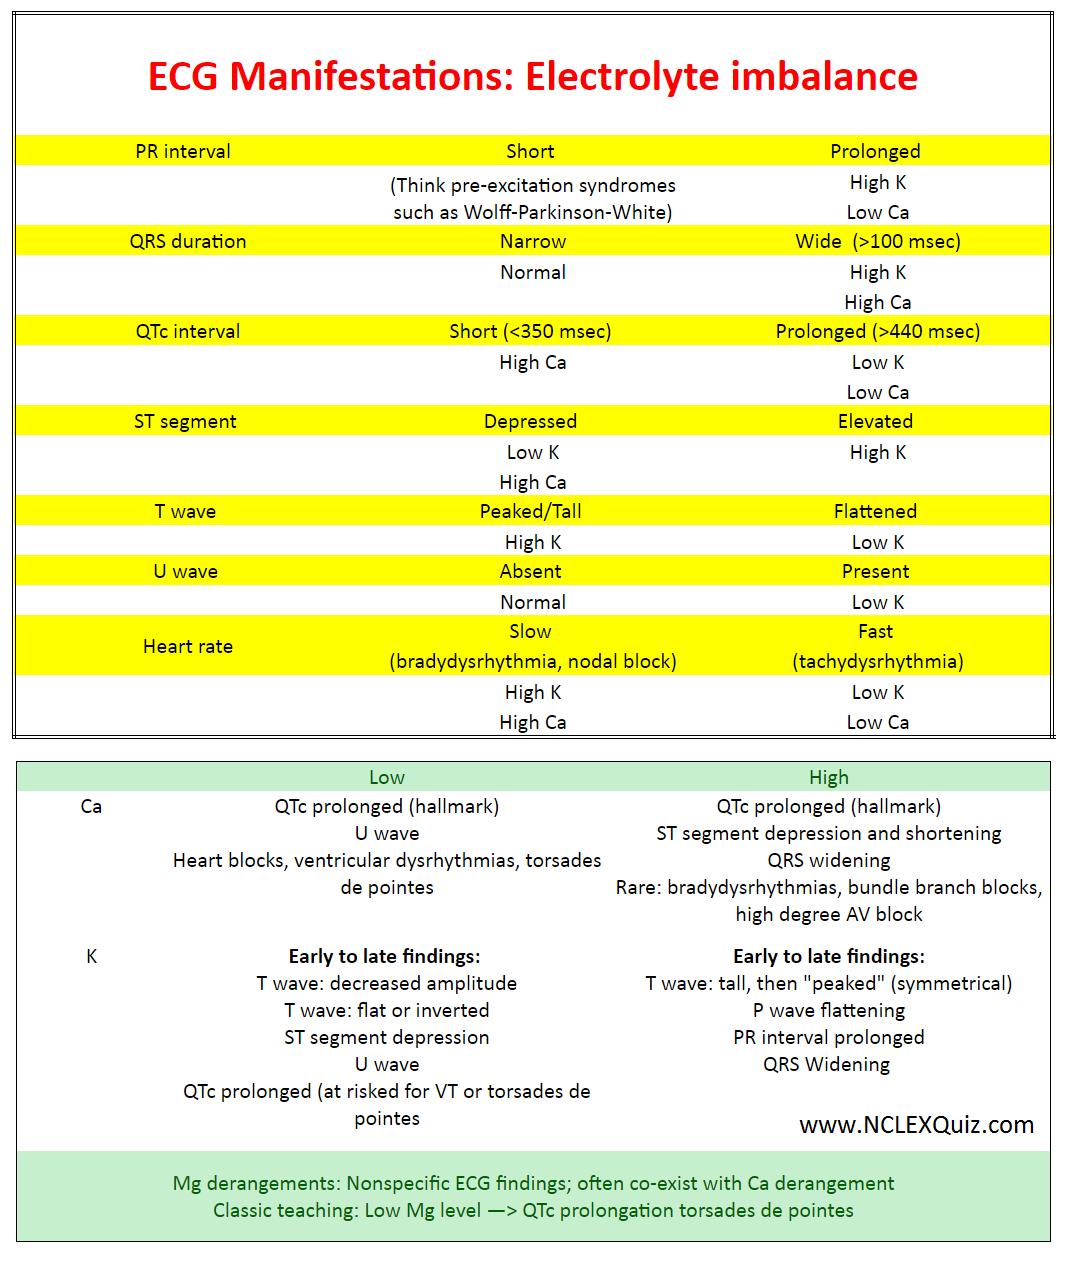 pharmacology case study potassium imbalance Water and electrolyte balance case study for later  case study about hypertension with electrolyte imbalance part 1  element measured sodium potassium urea.